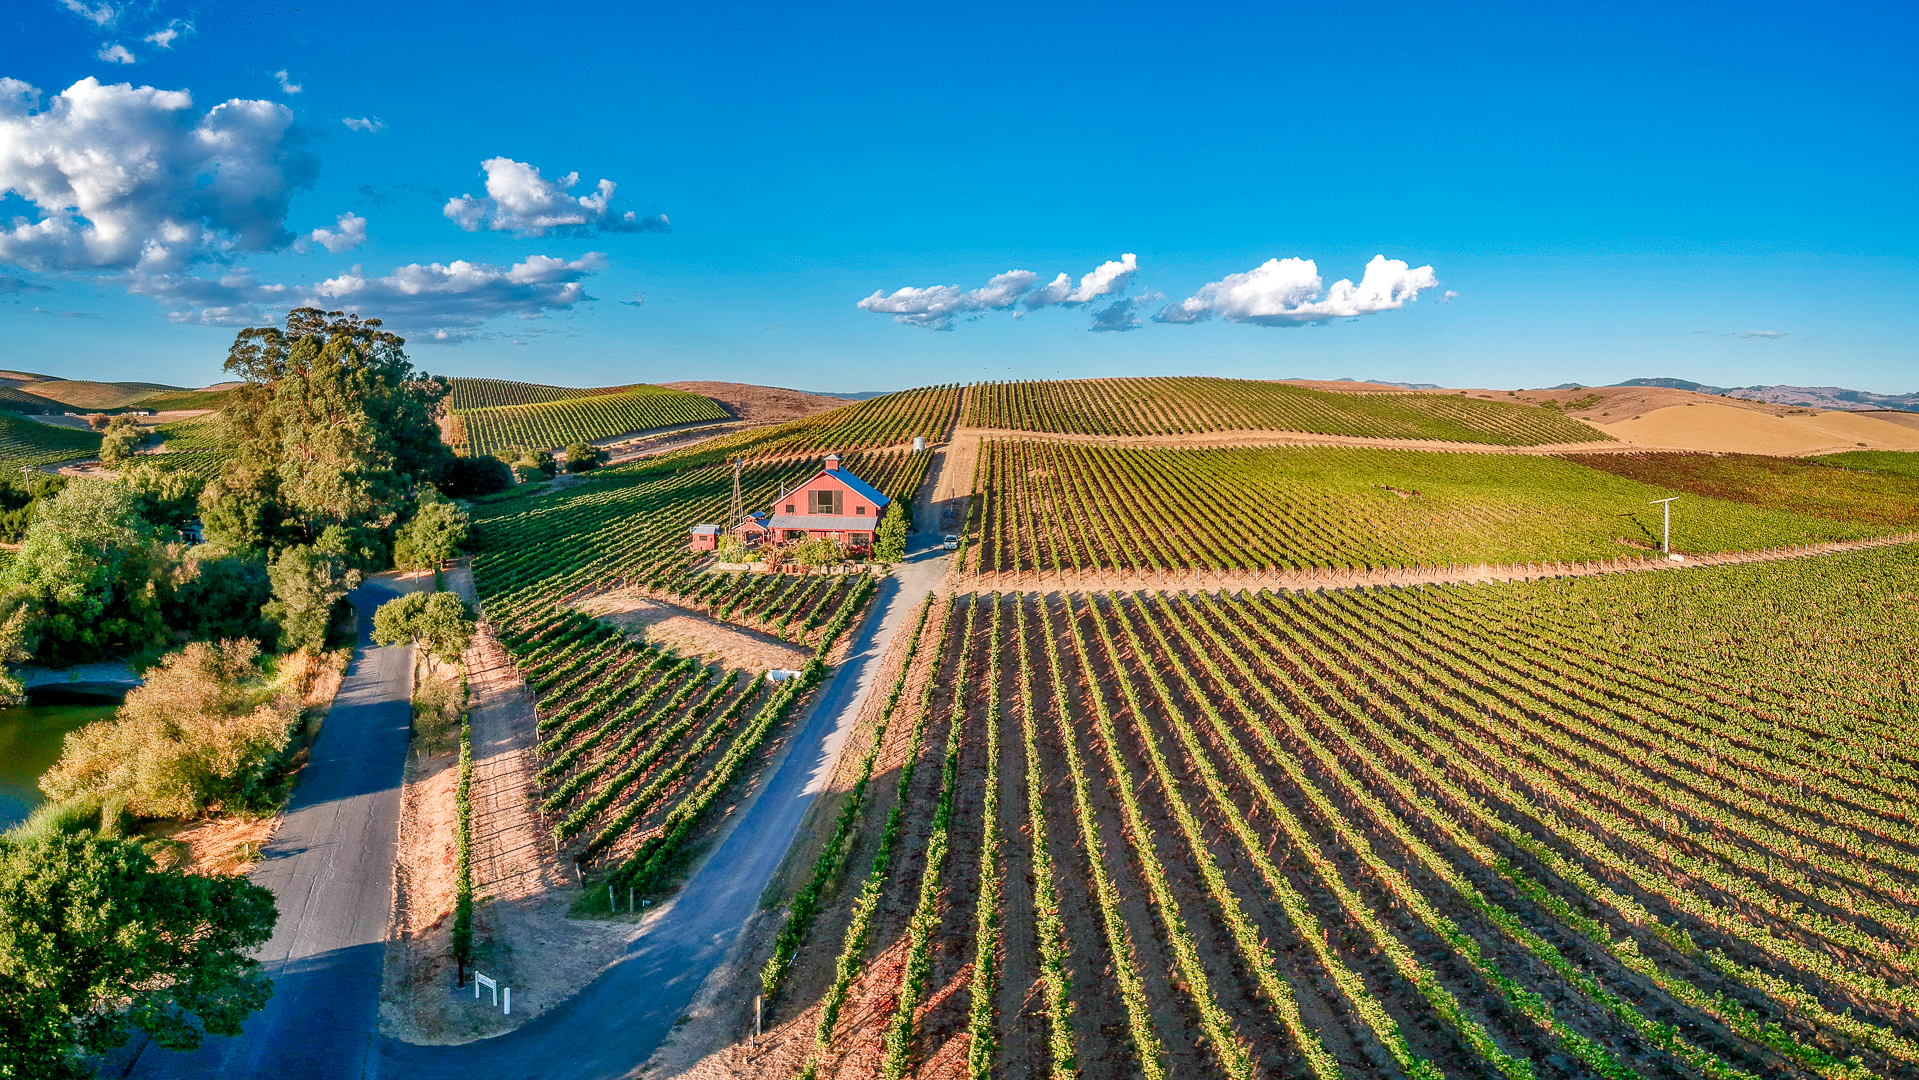 BOWERS Wine Tours Carneros vineyard view1_DJI_0001-5-Pano_Luminar2018-edit.jpg